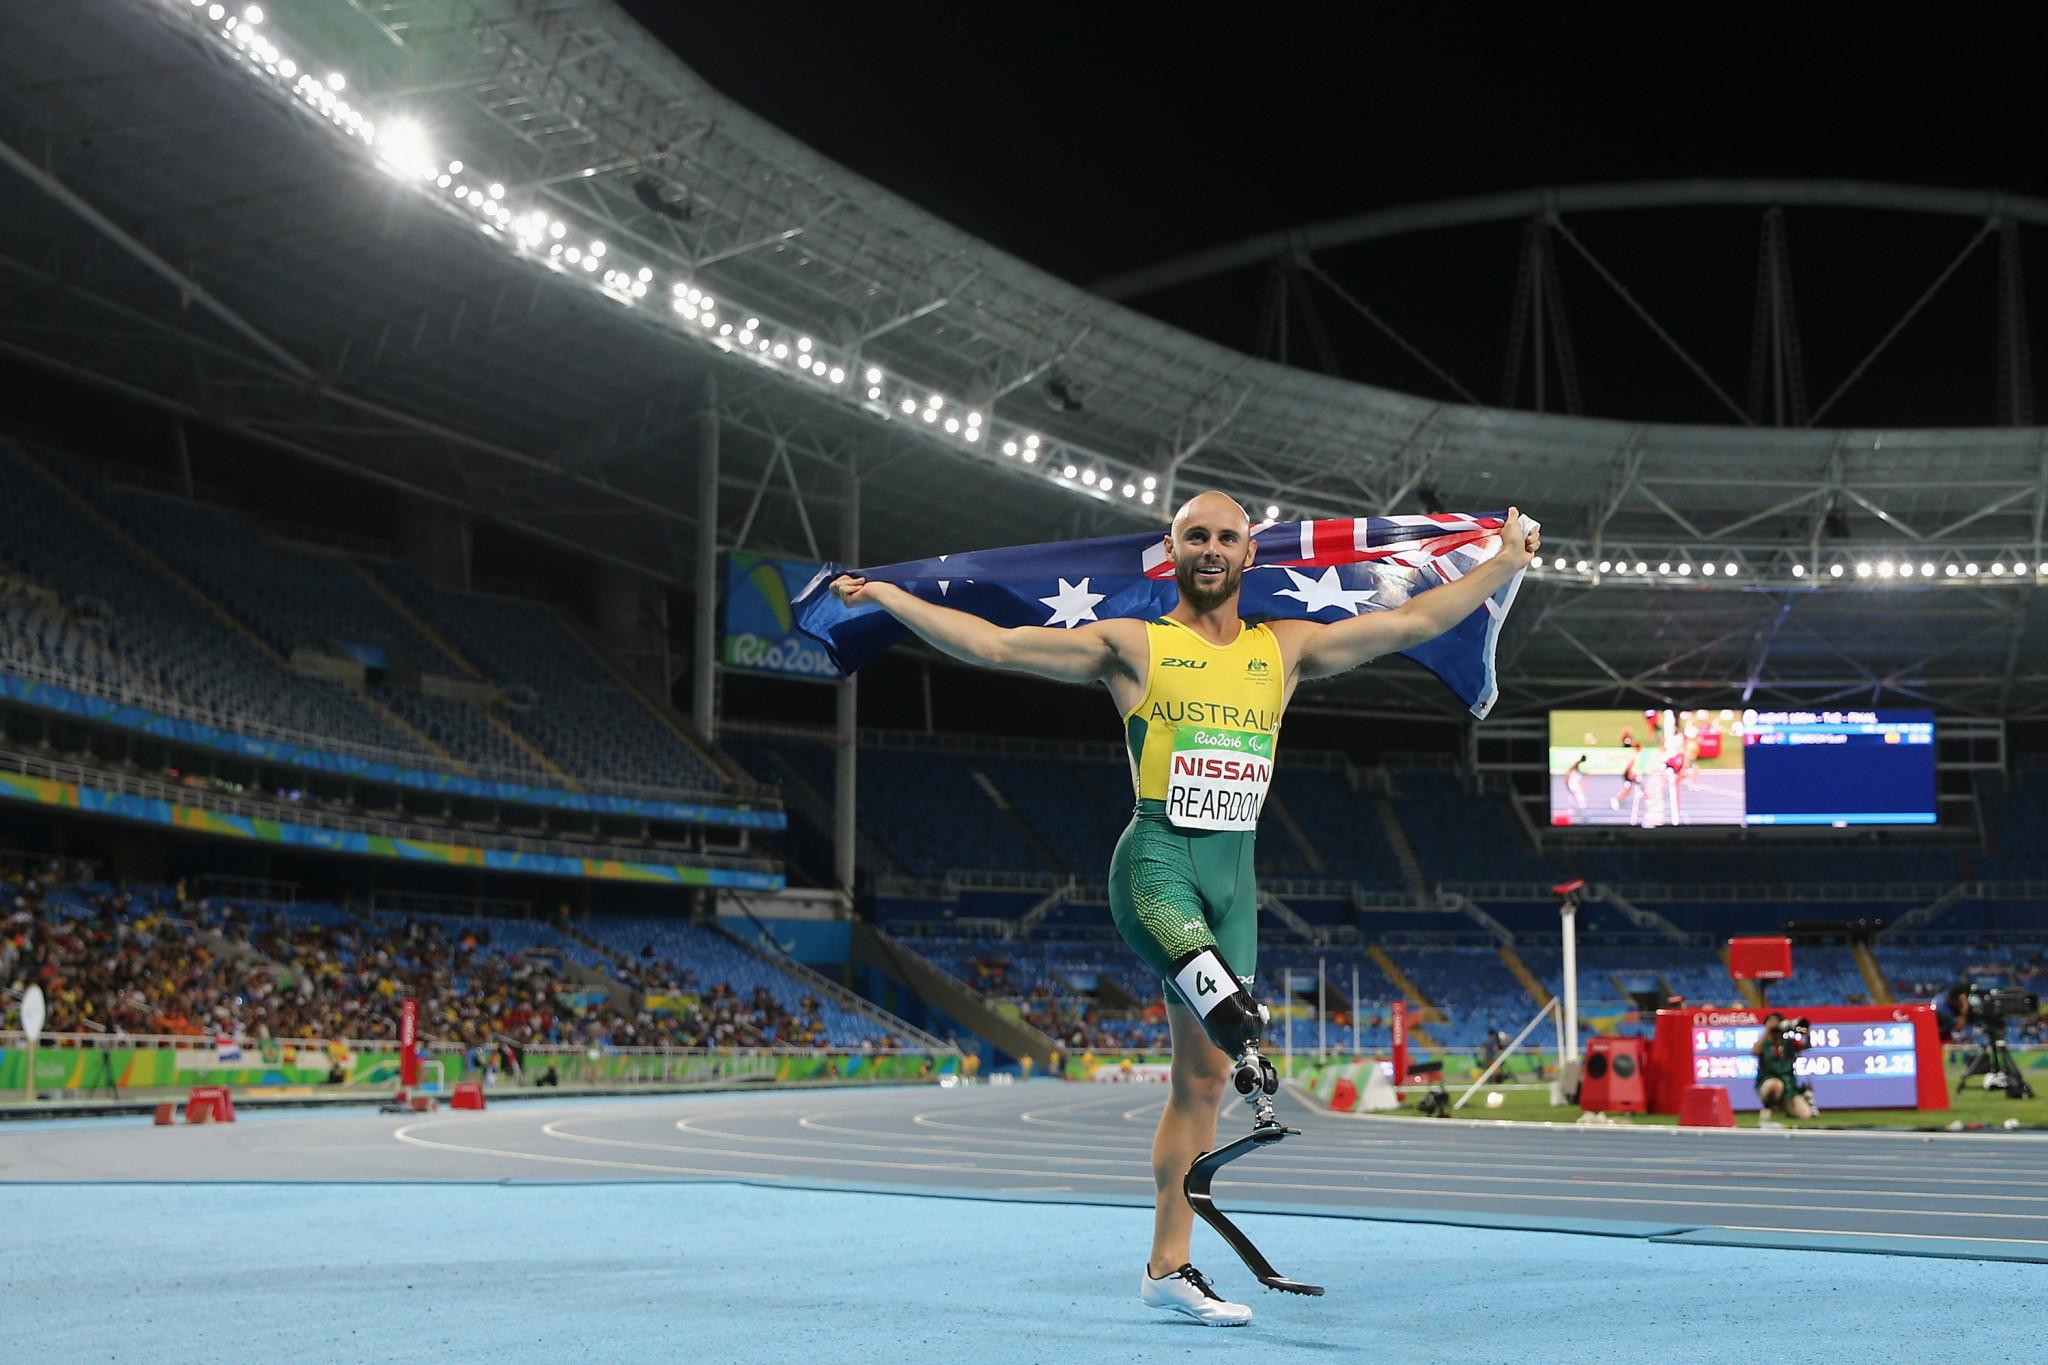 Reardon announces retirement following last international competition at Tokyo 2020